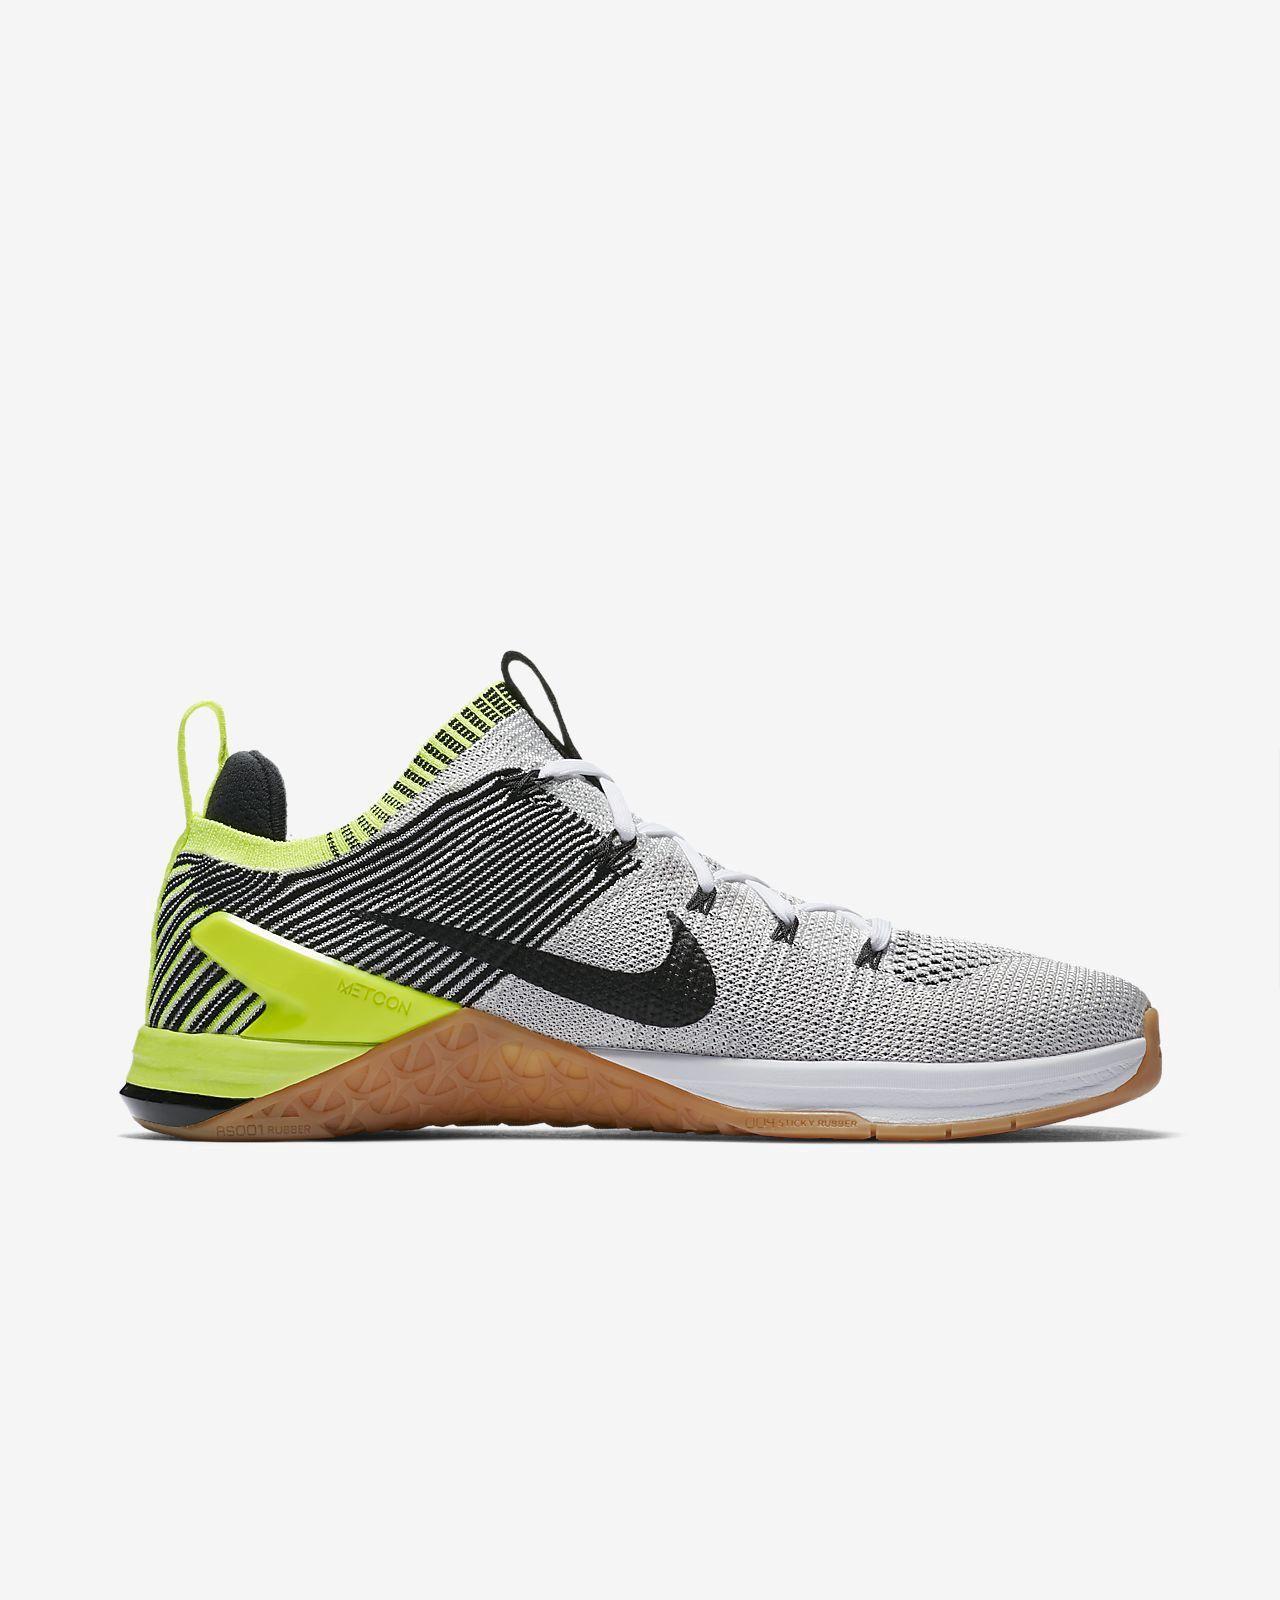 96aa553a7497 Nike Metcon Dsx Flyknit 2 Men s Cross Training Weightlifting Shoe ...